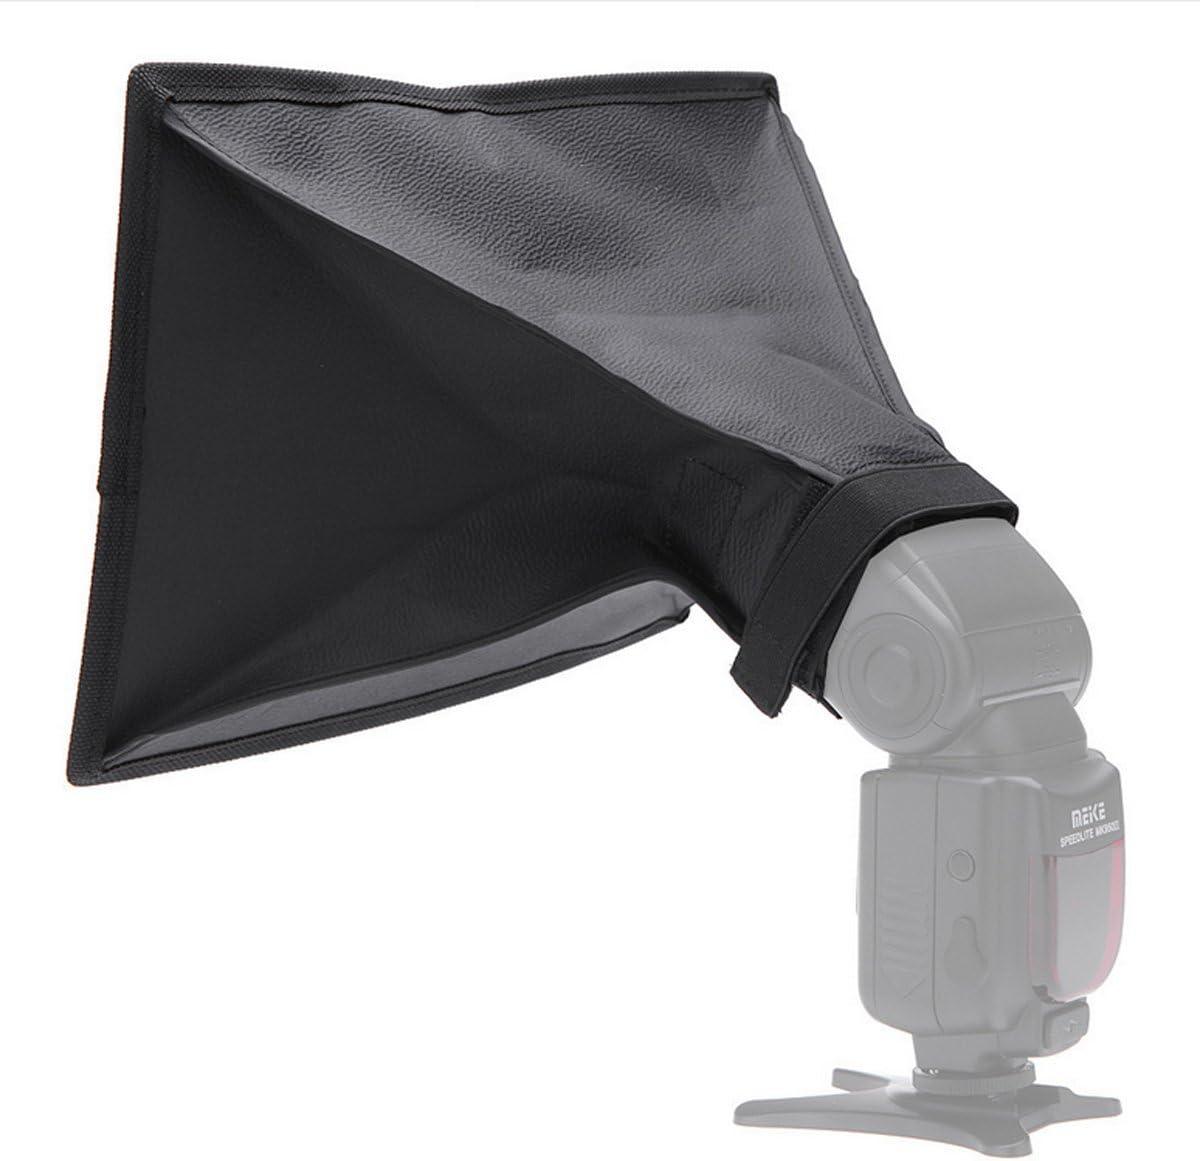 flycoo Mini 20//× 30/cm 7.87//× 11.81/faltbar Diffusor Kamera Flash Softbox f/ür LED Flash Video Licht